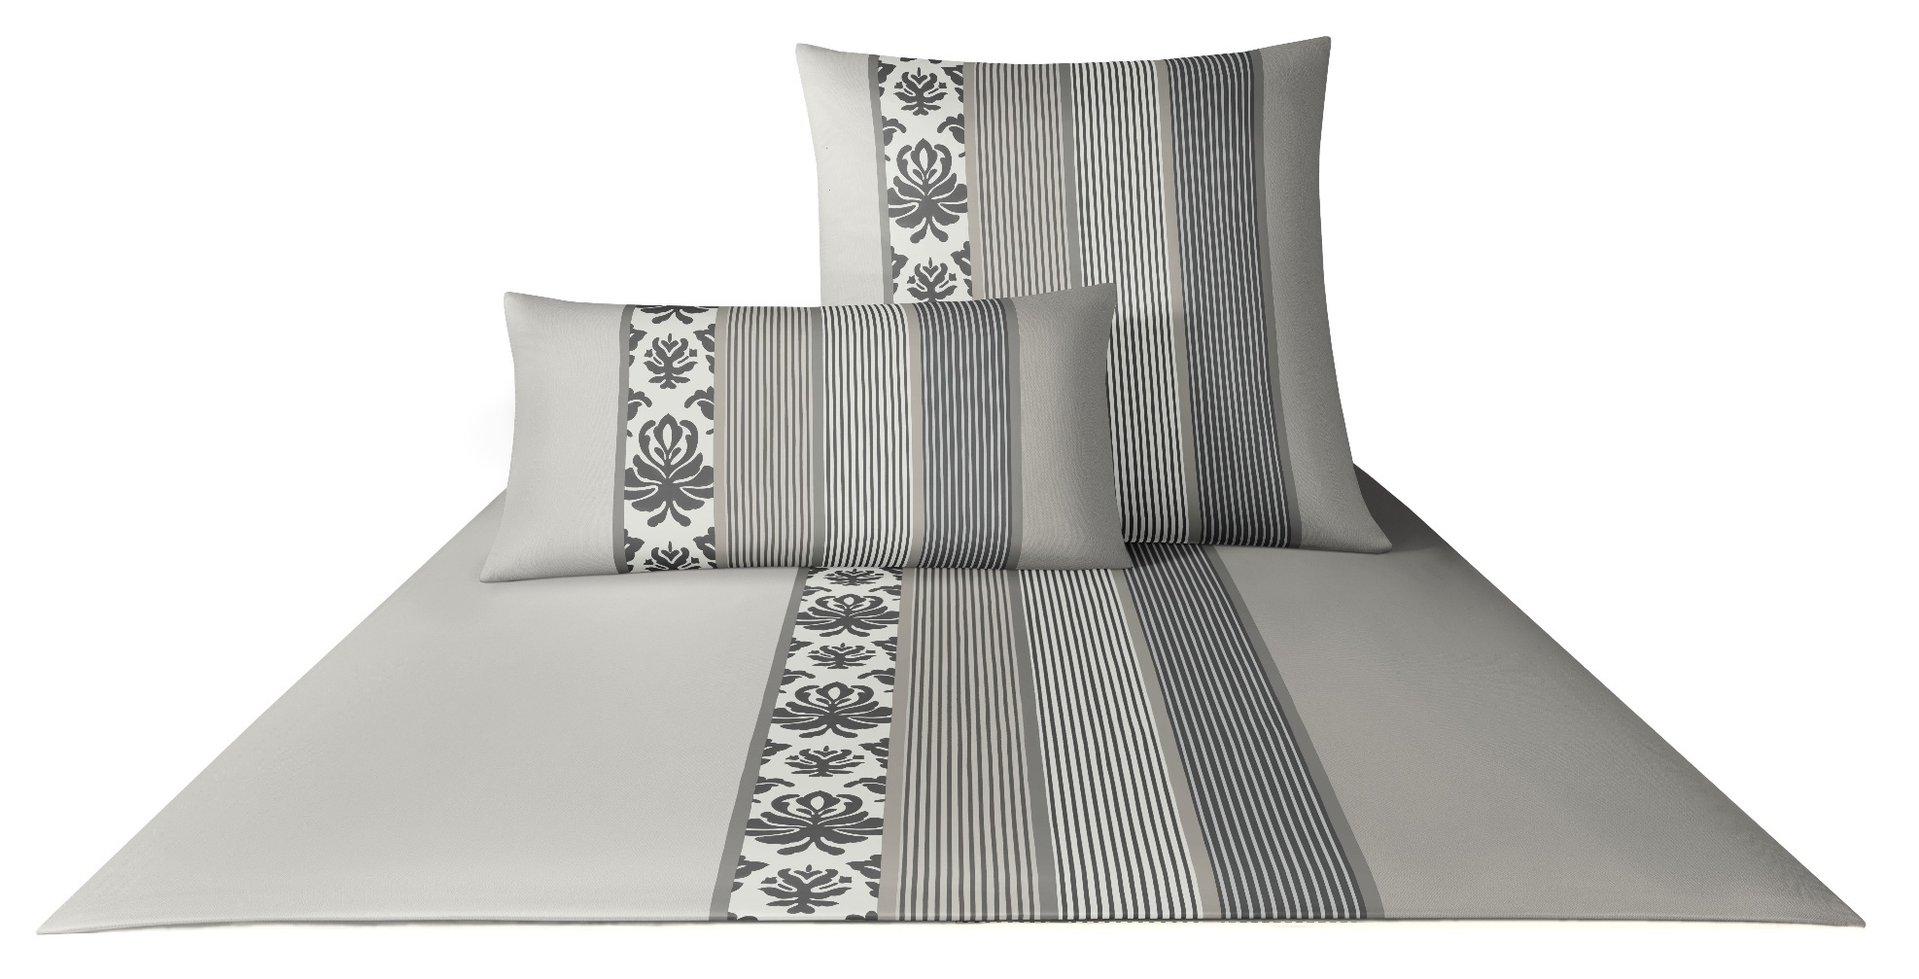 joop ornament stripes mako satin bettw sche graphit 77. Black Bedroom Furniture Sets. Home Design Ideas